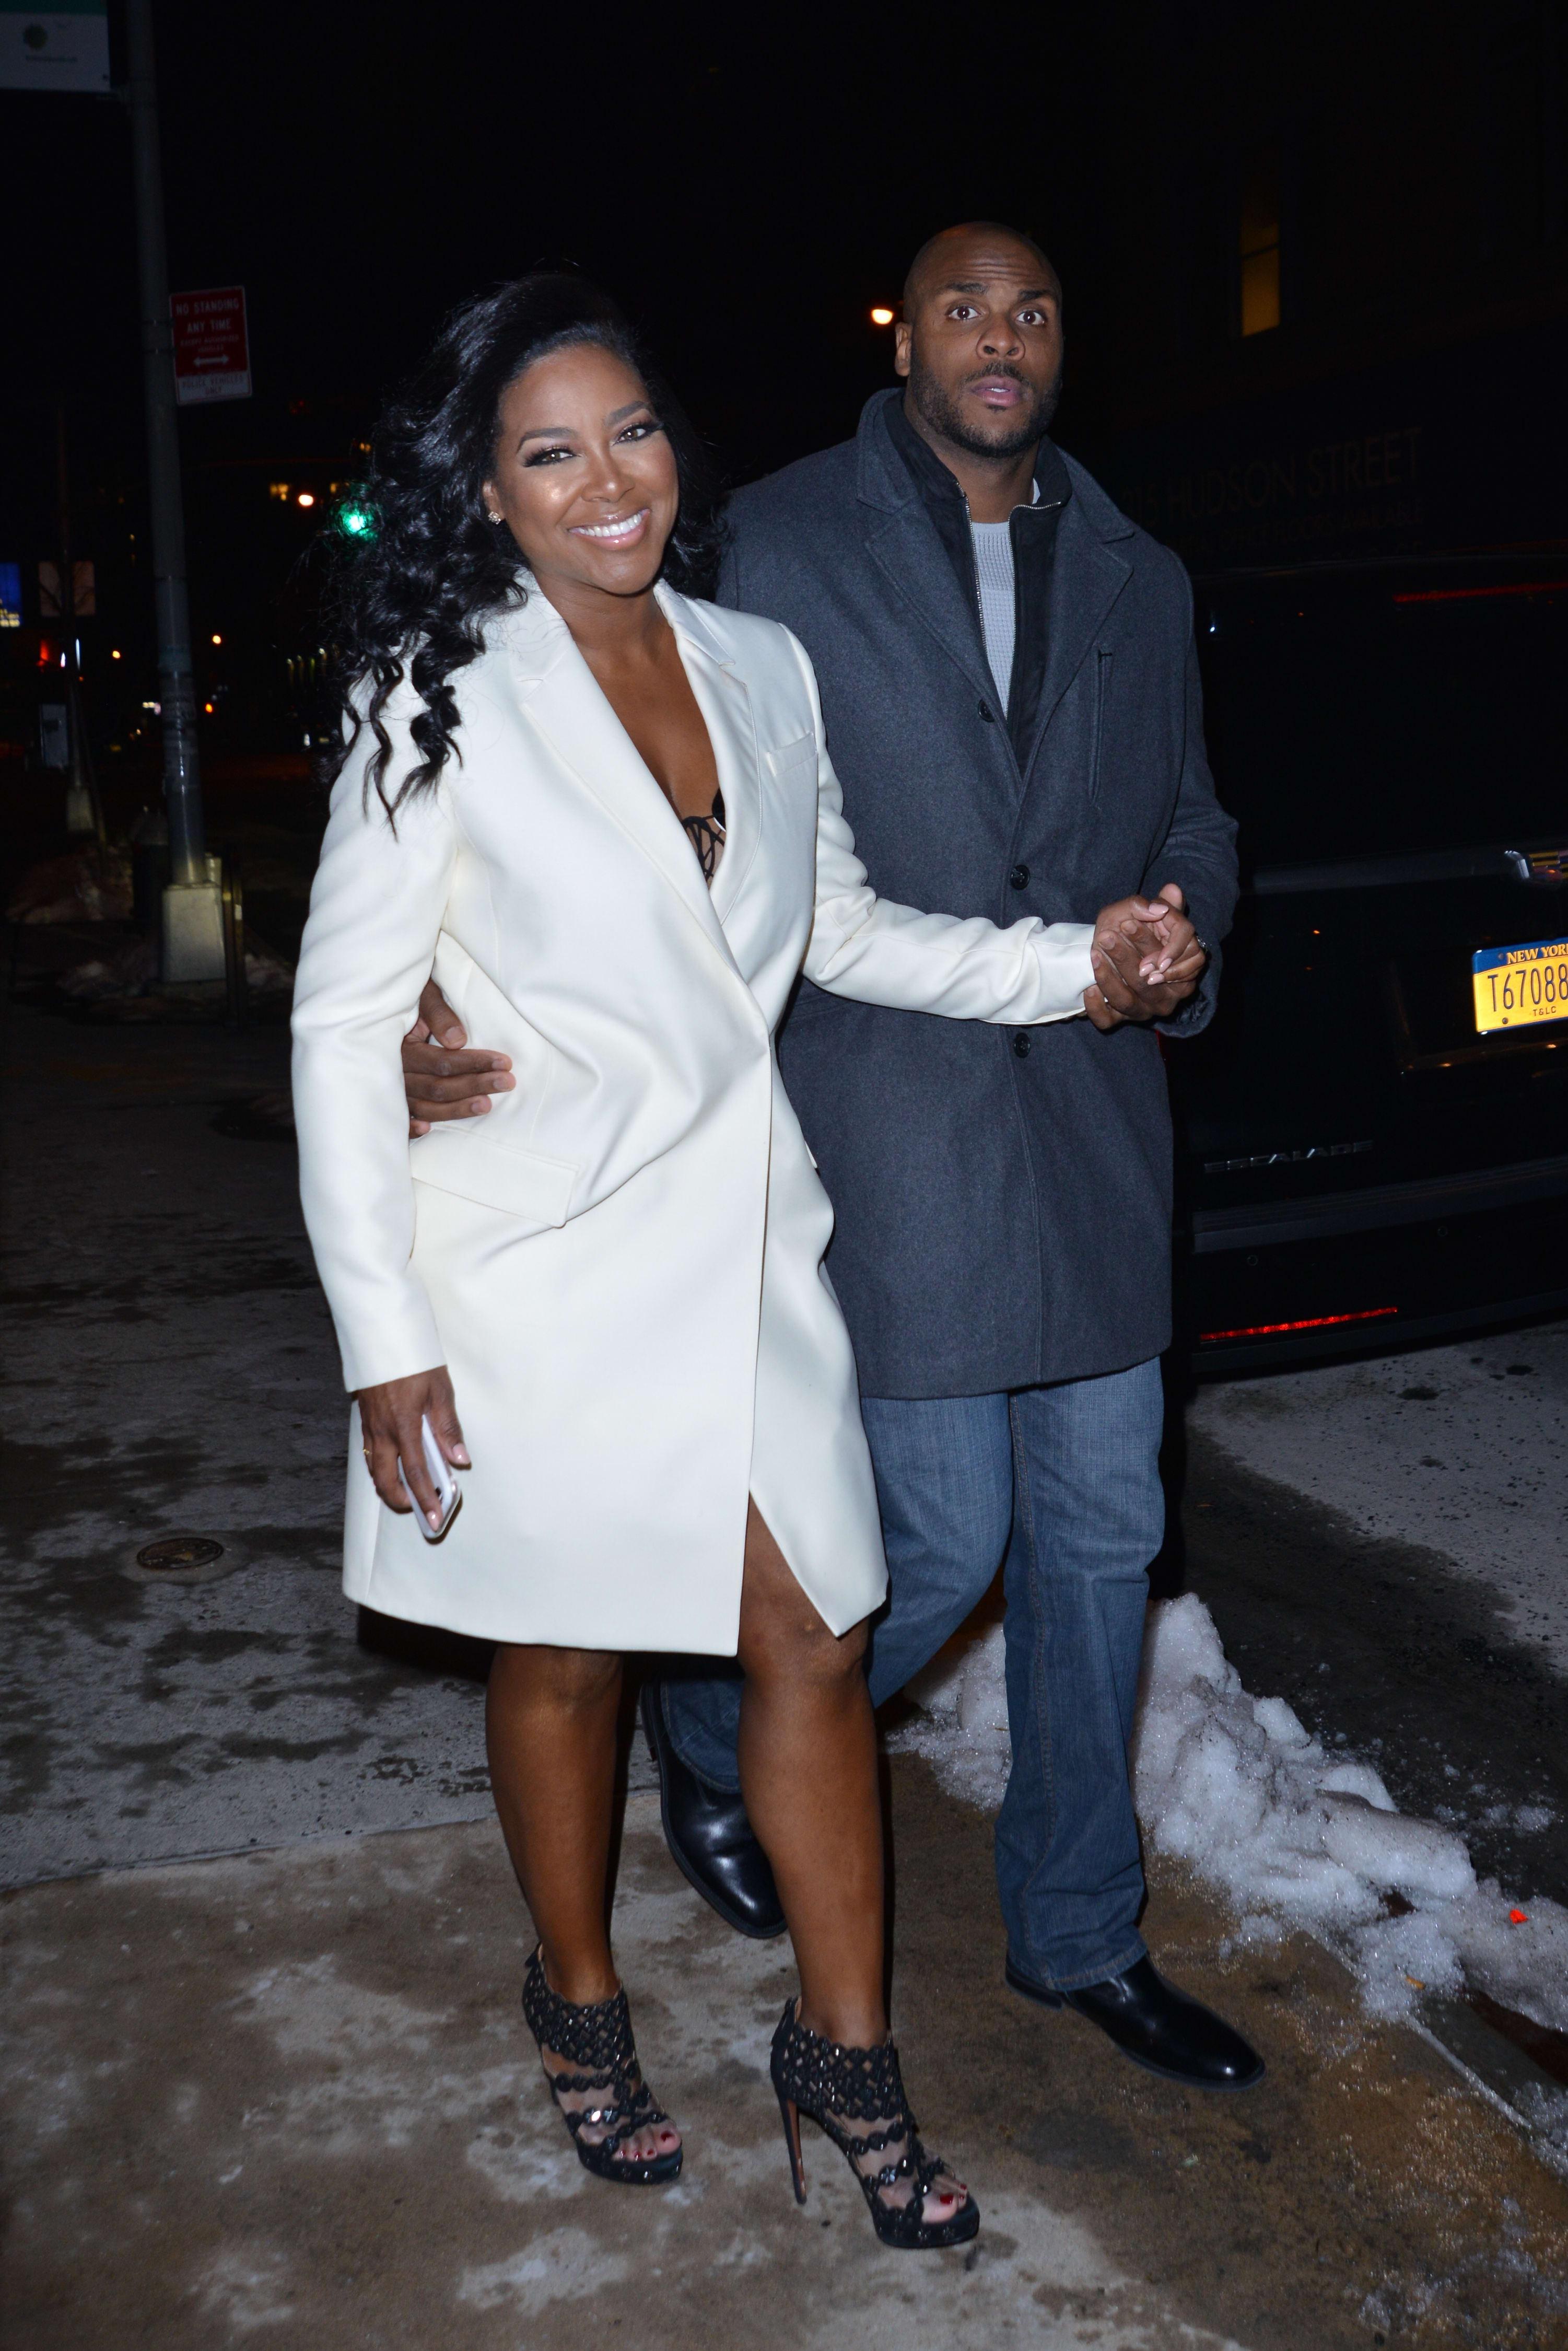 Kenya Moore Wedding.Kenya Moore Unveils Wedding Pictures Matt Jordan Claims She Cheated